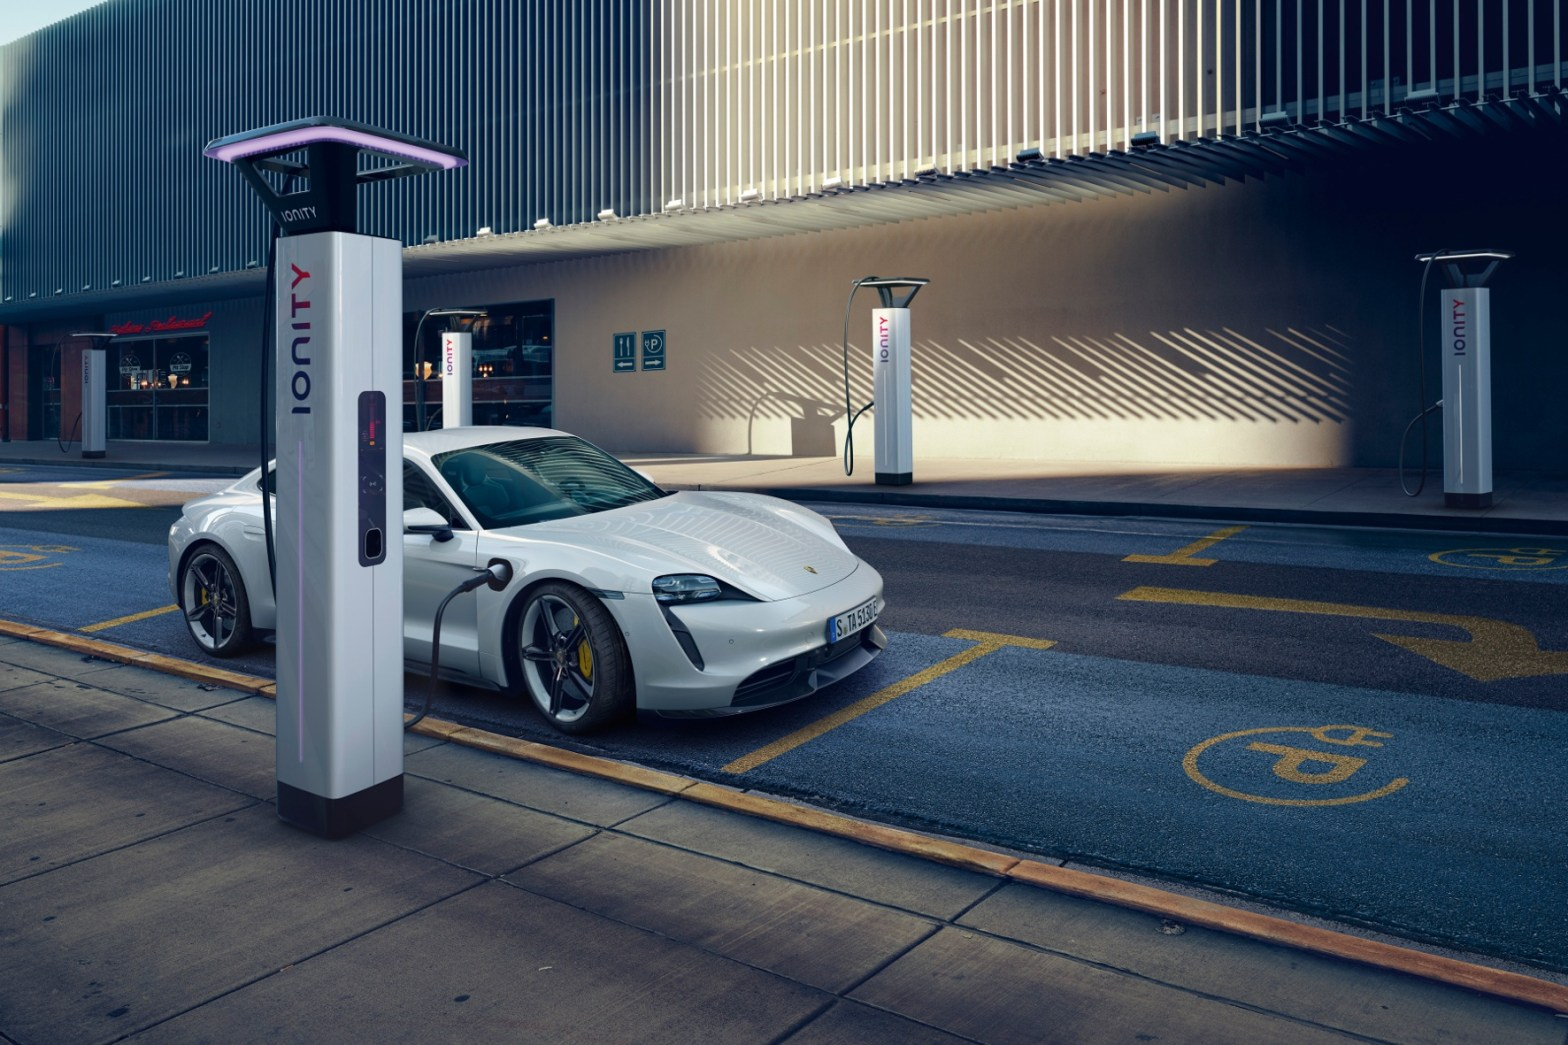 Porsche an der E-Ladesäule